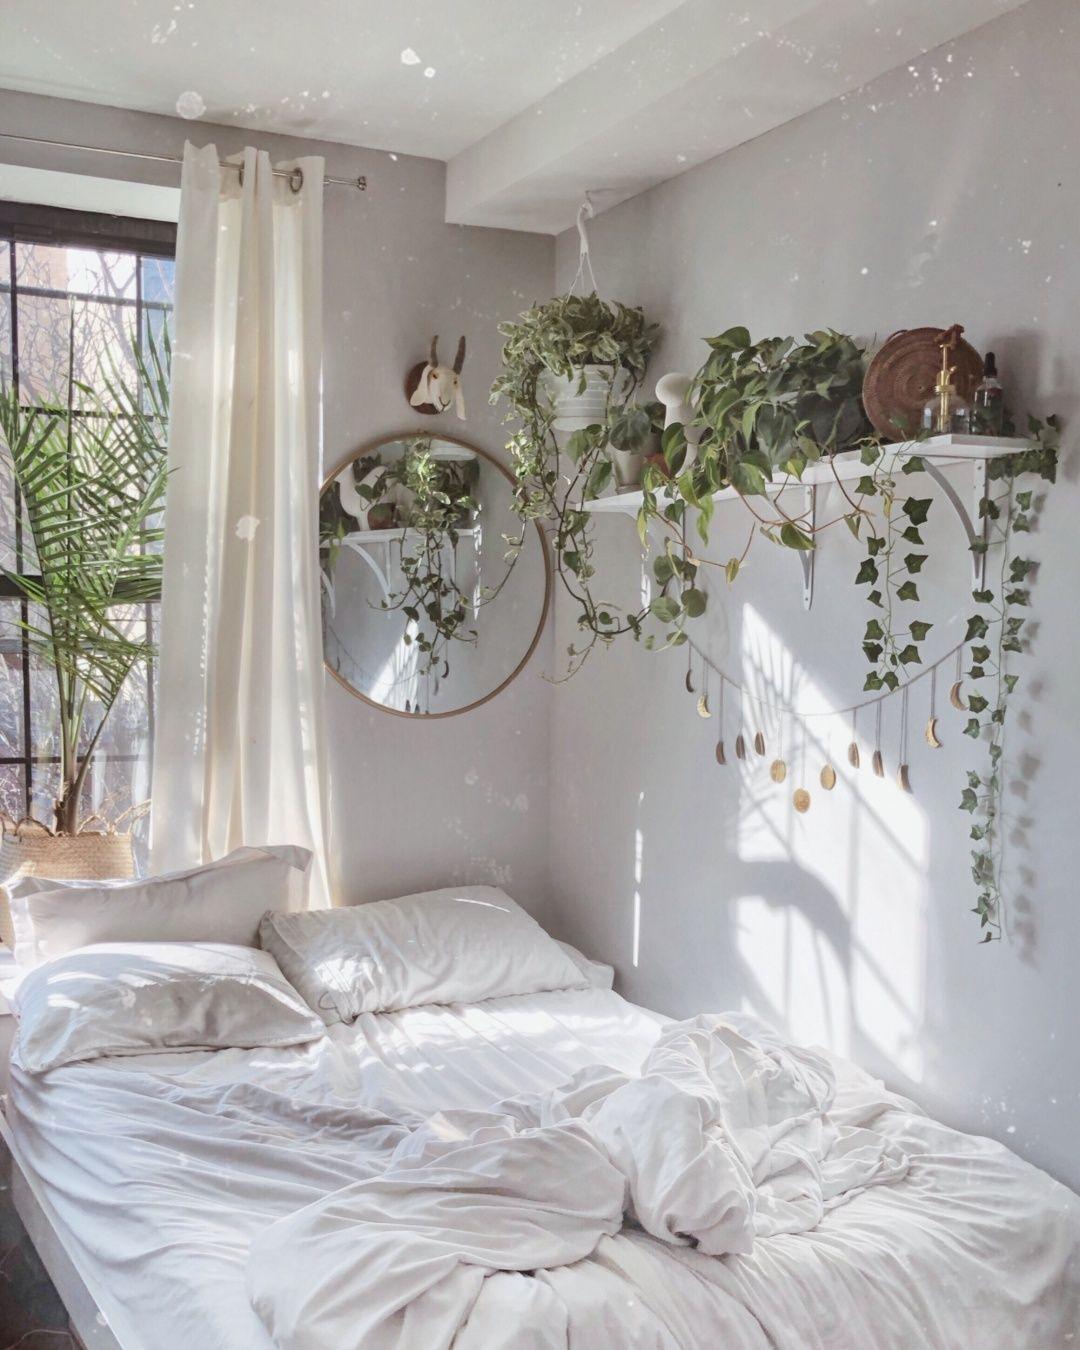 Dreamy Bedroom Full Of Plants Opulentmemory Beautiful Bedroom Decor Bedroom Decor Room Ideas Bedroom